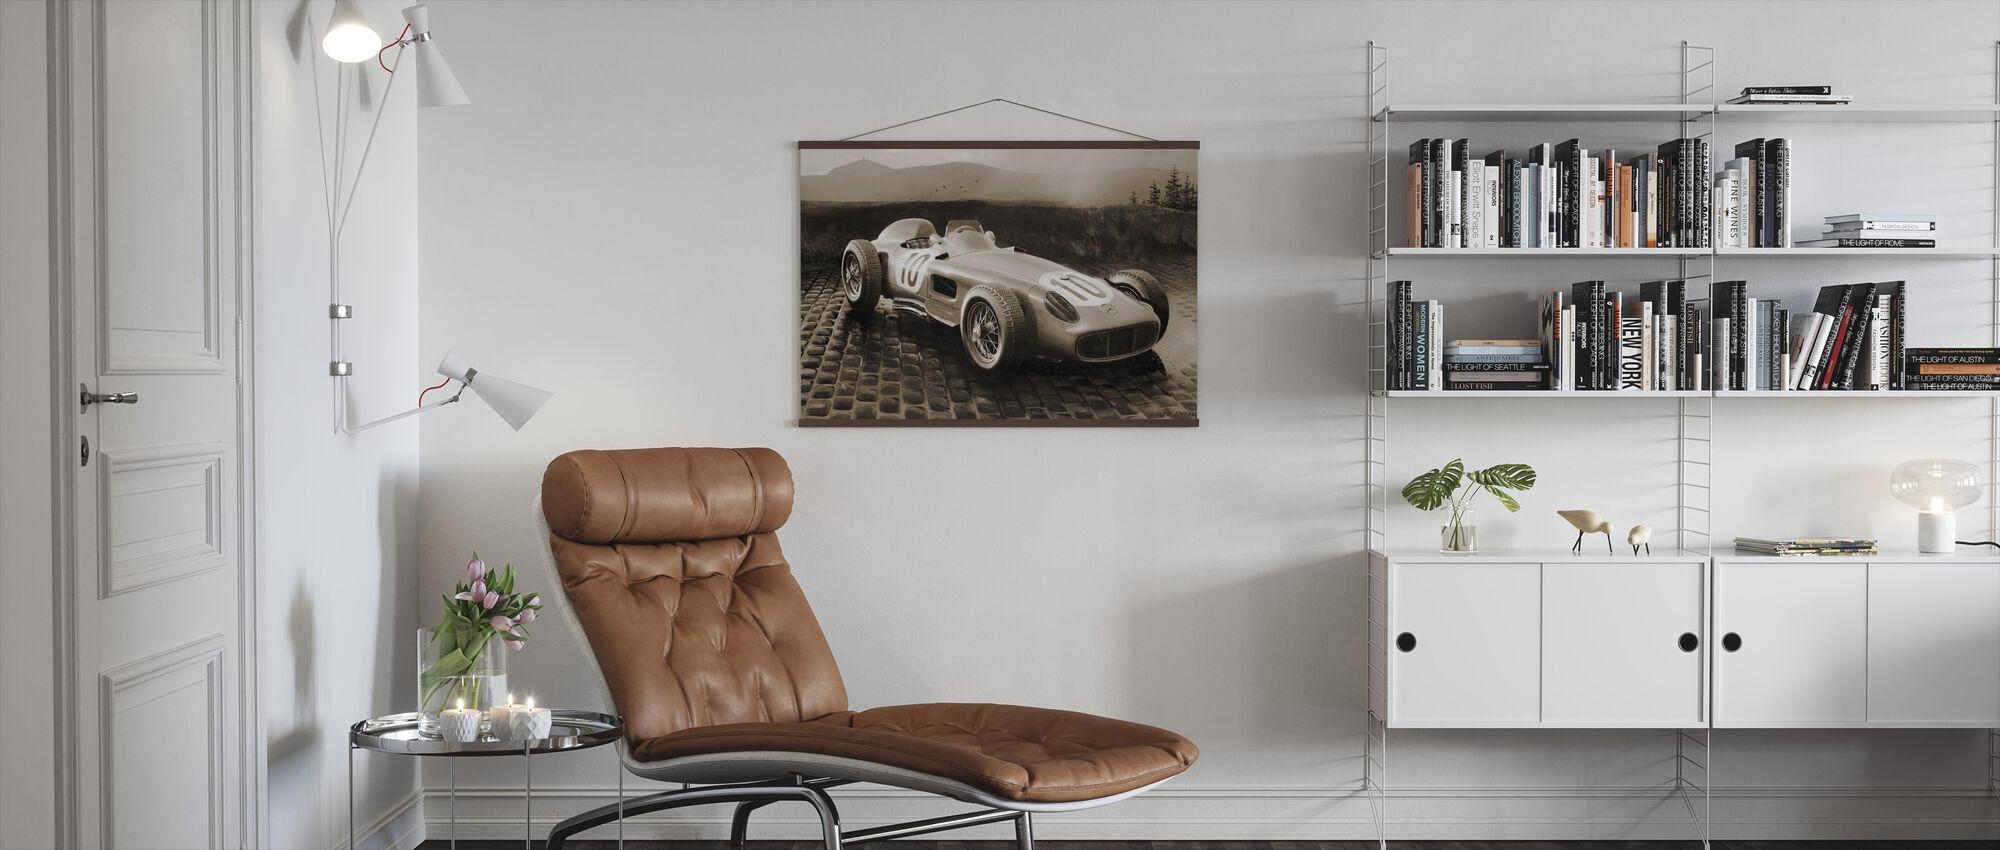 Car 1954 Sepia - Poster - Living Room